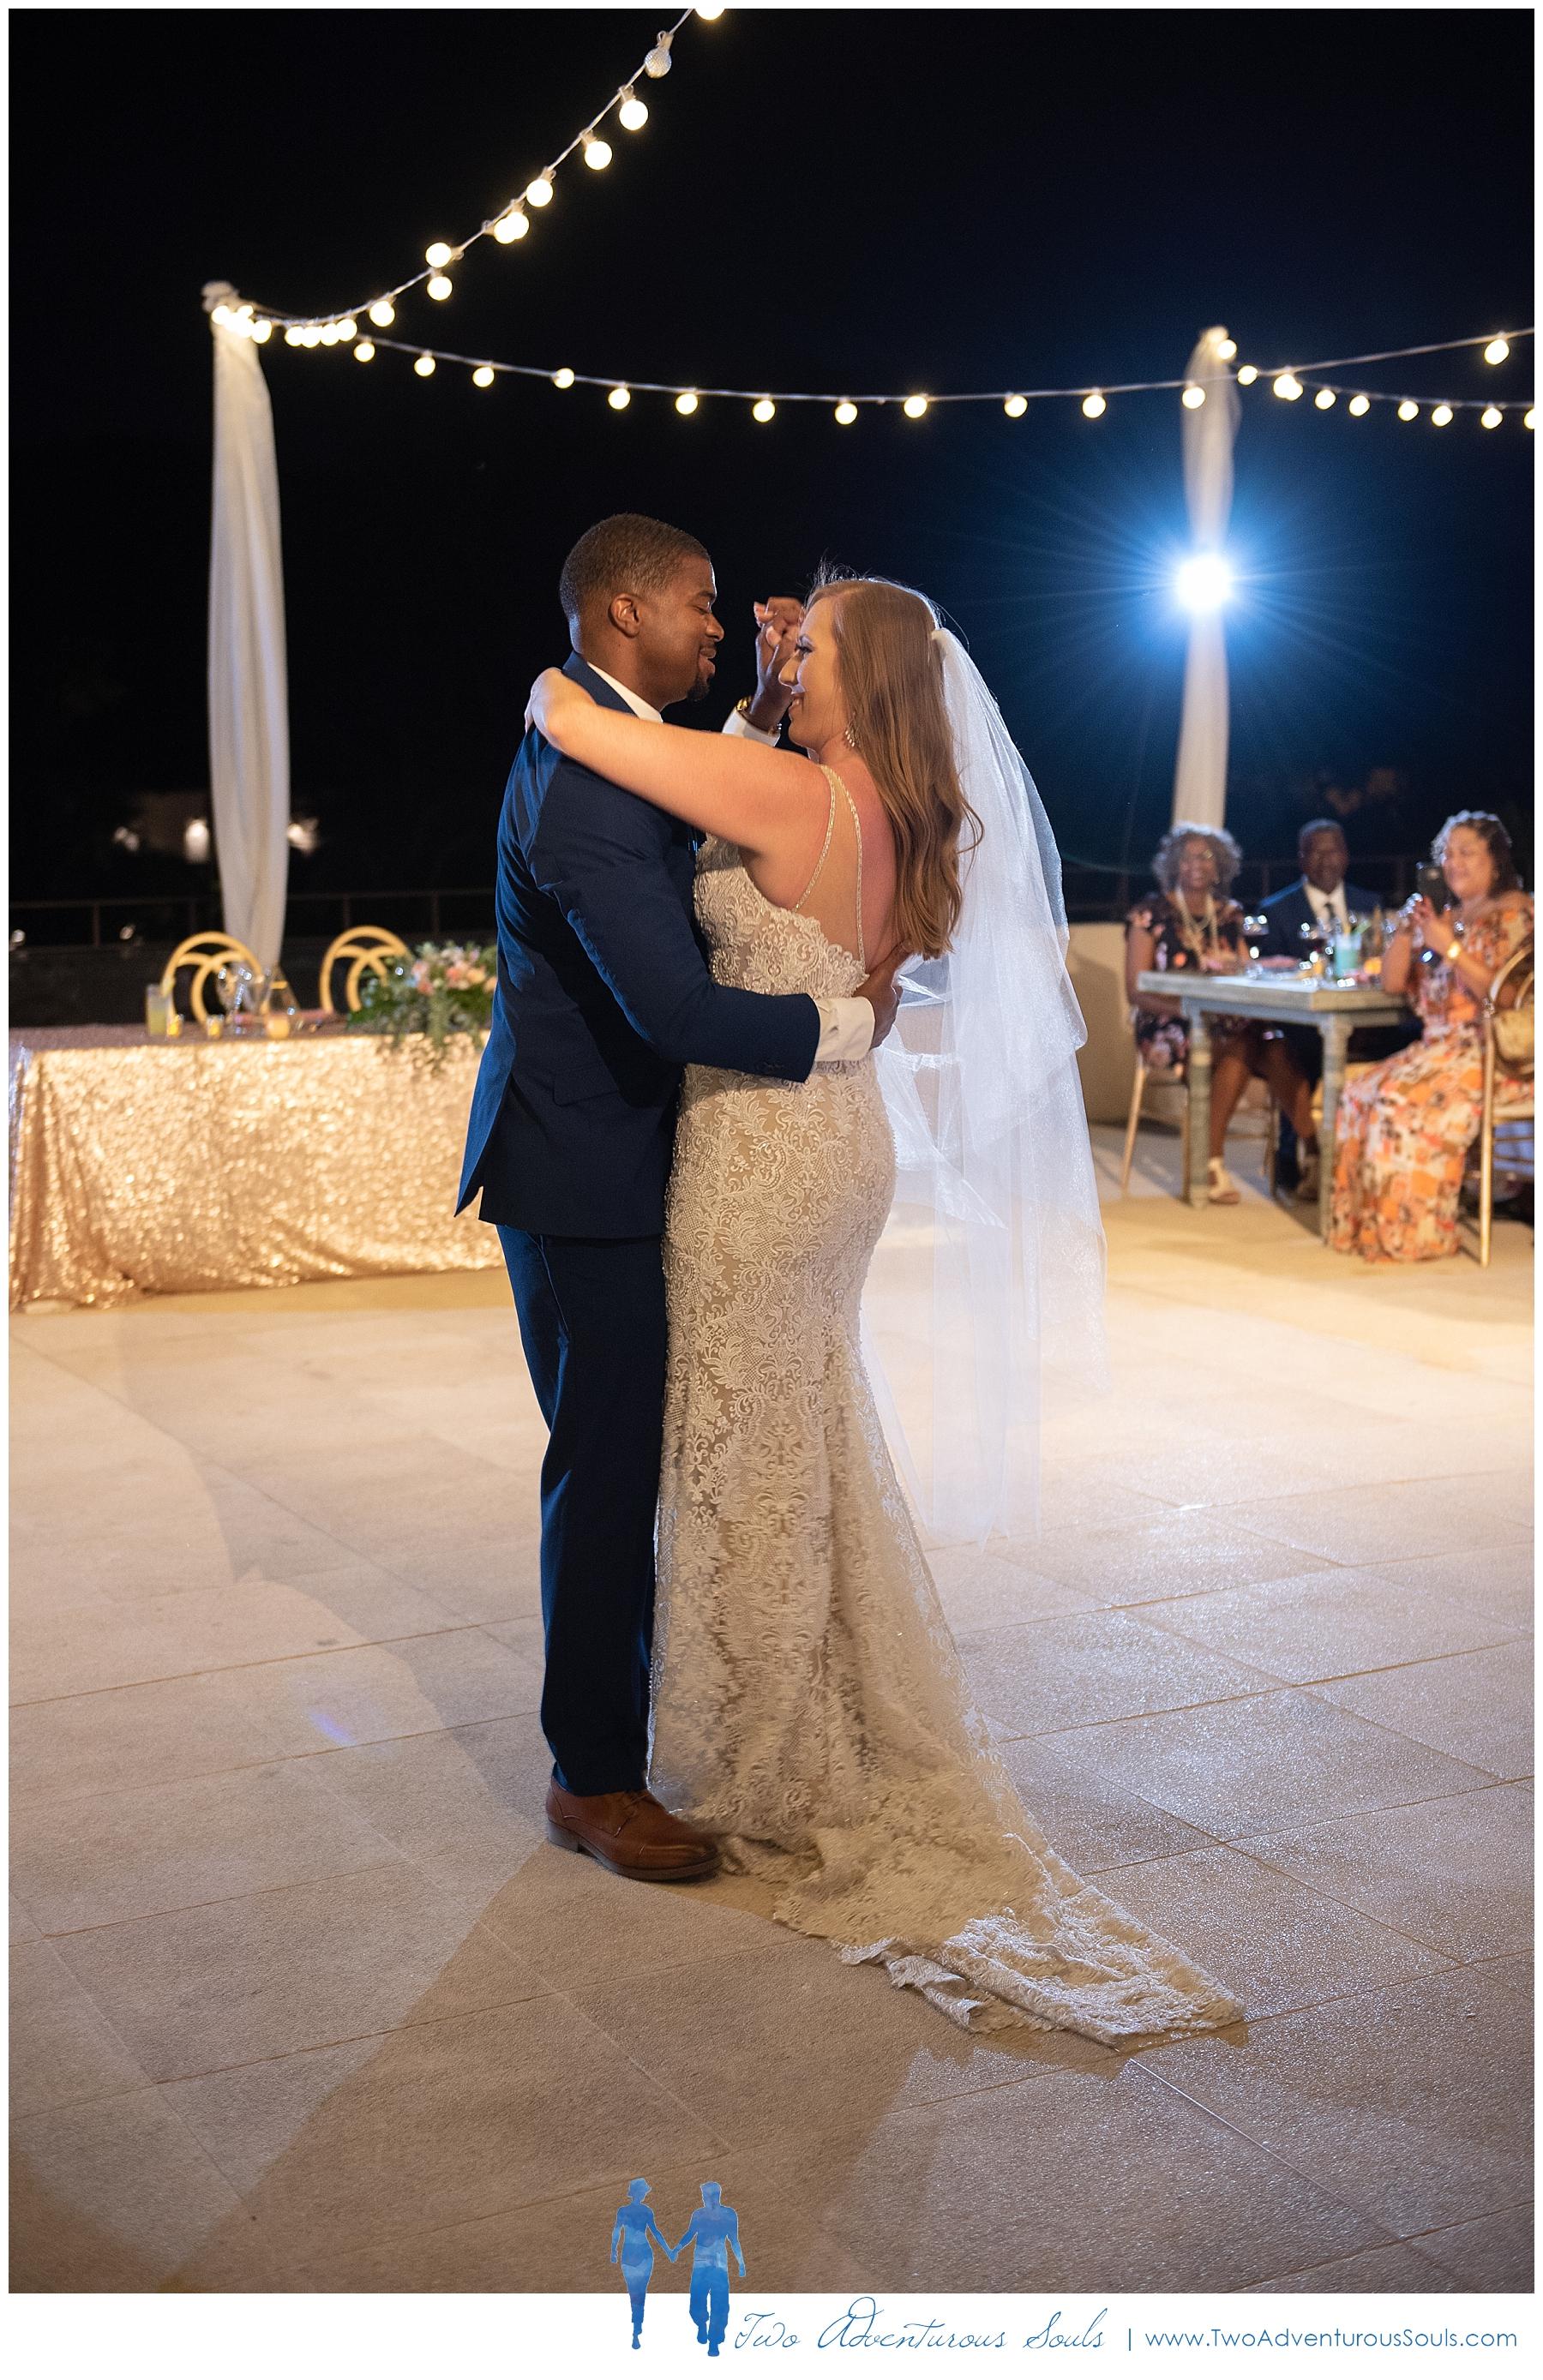 Costa Rica Wedding Photographers, Dreams las Mareas Wedding, Destination Wedding Photographers, Two Adventurous Souls - 022219_0042.jpg